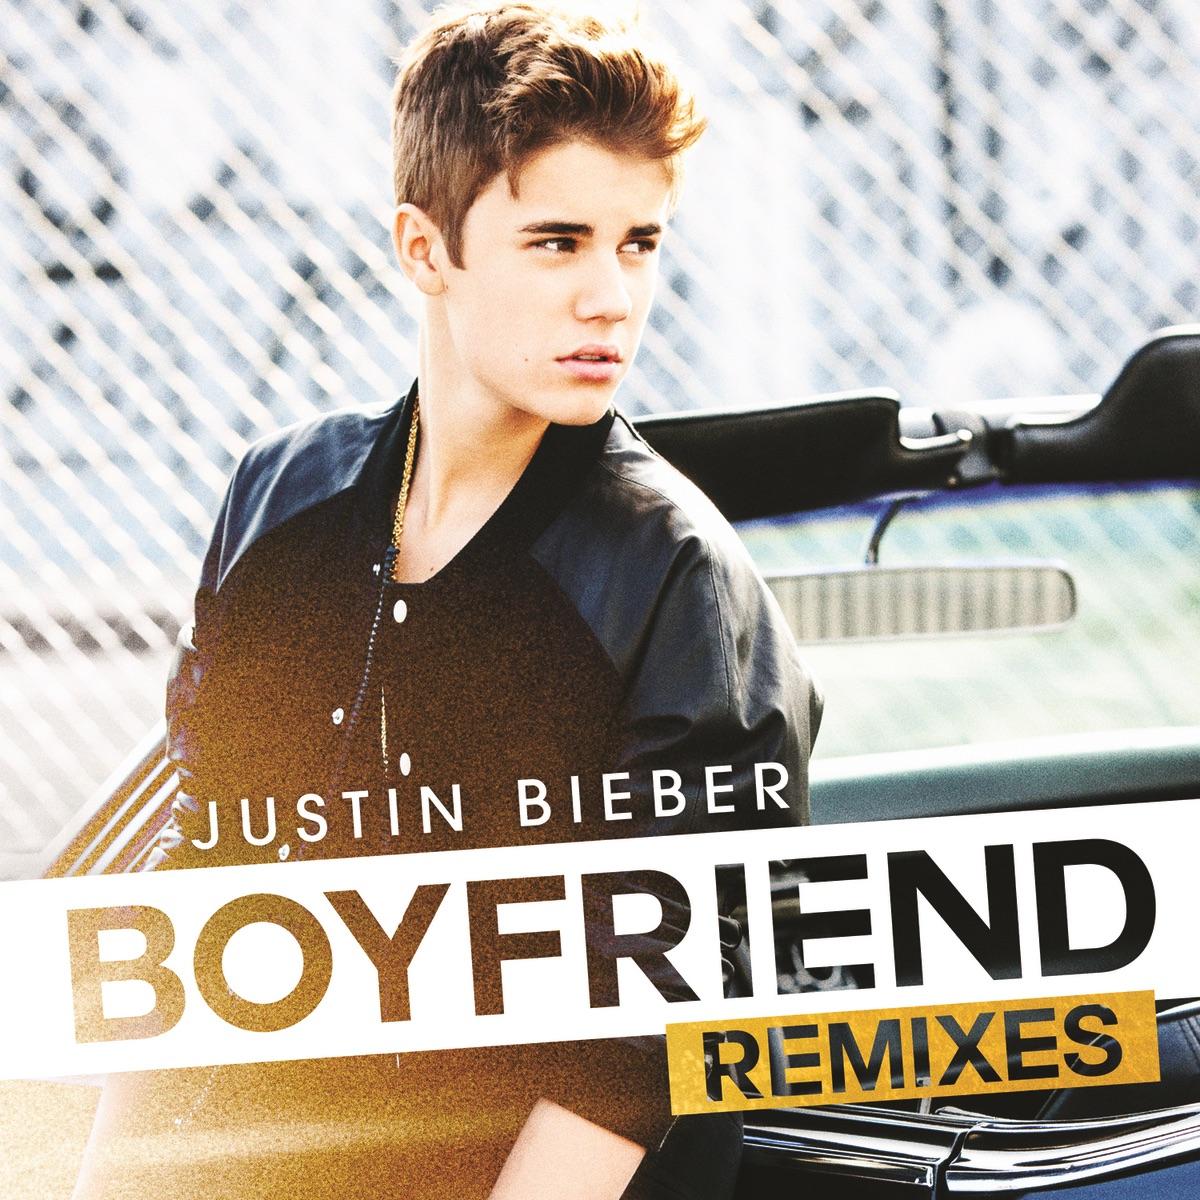 Justin Bieber - Boyfriend (Remixes) Cover